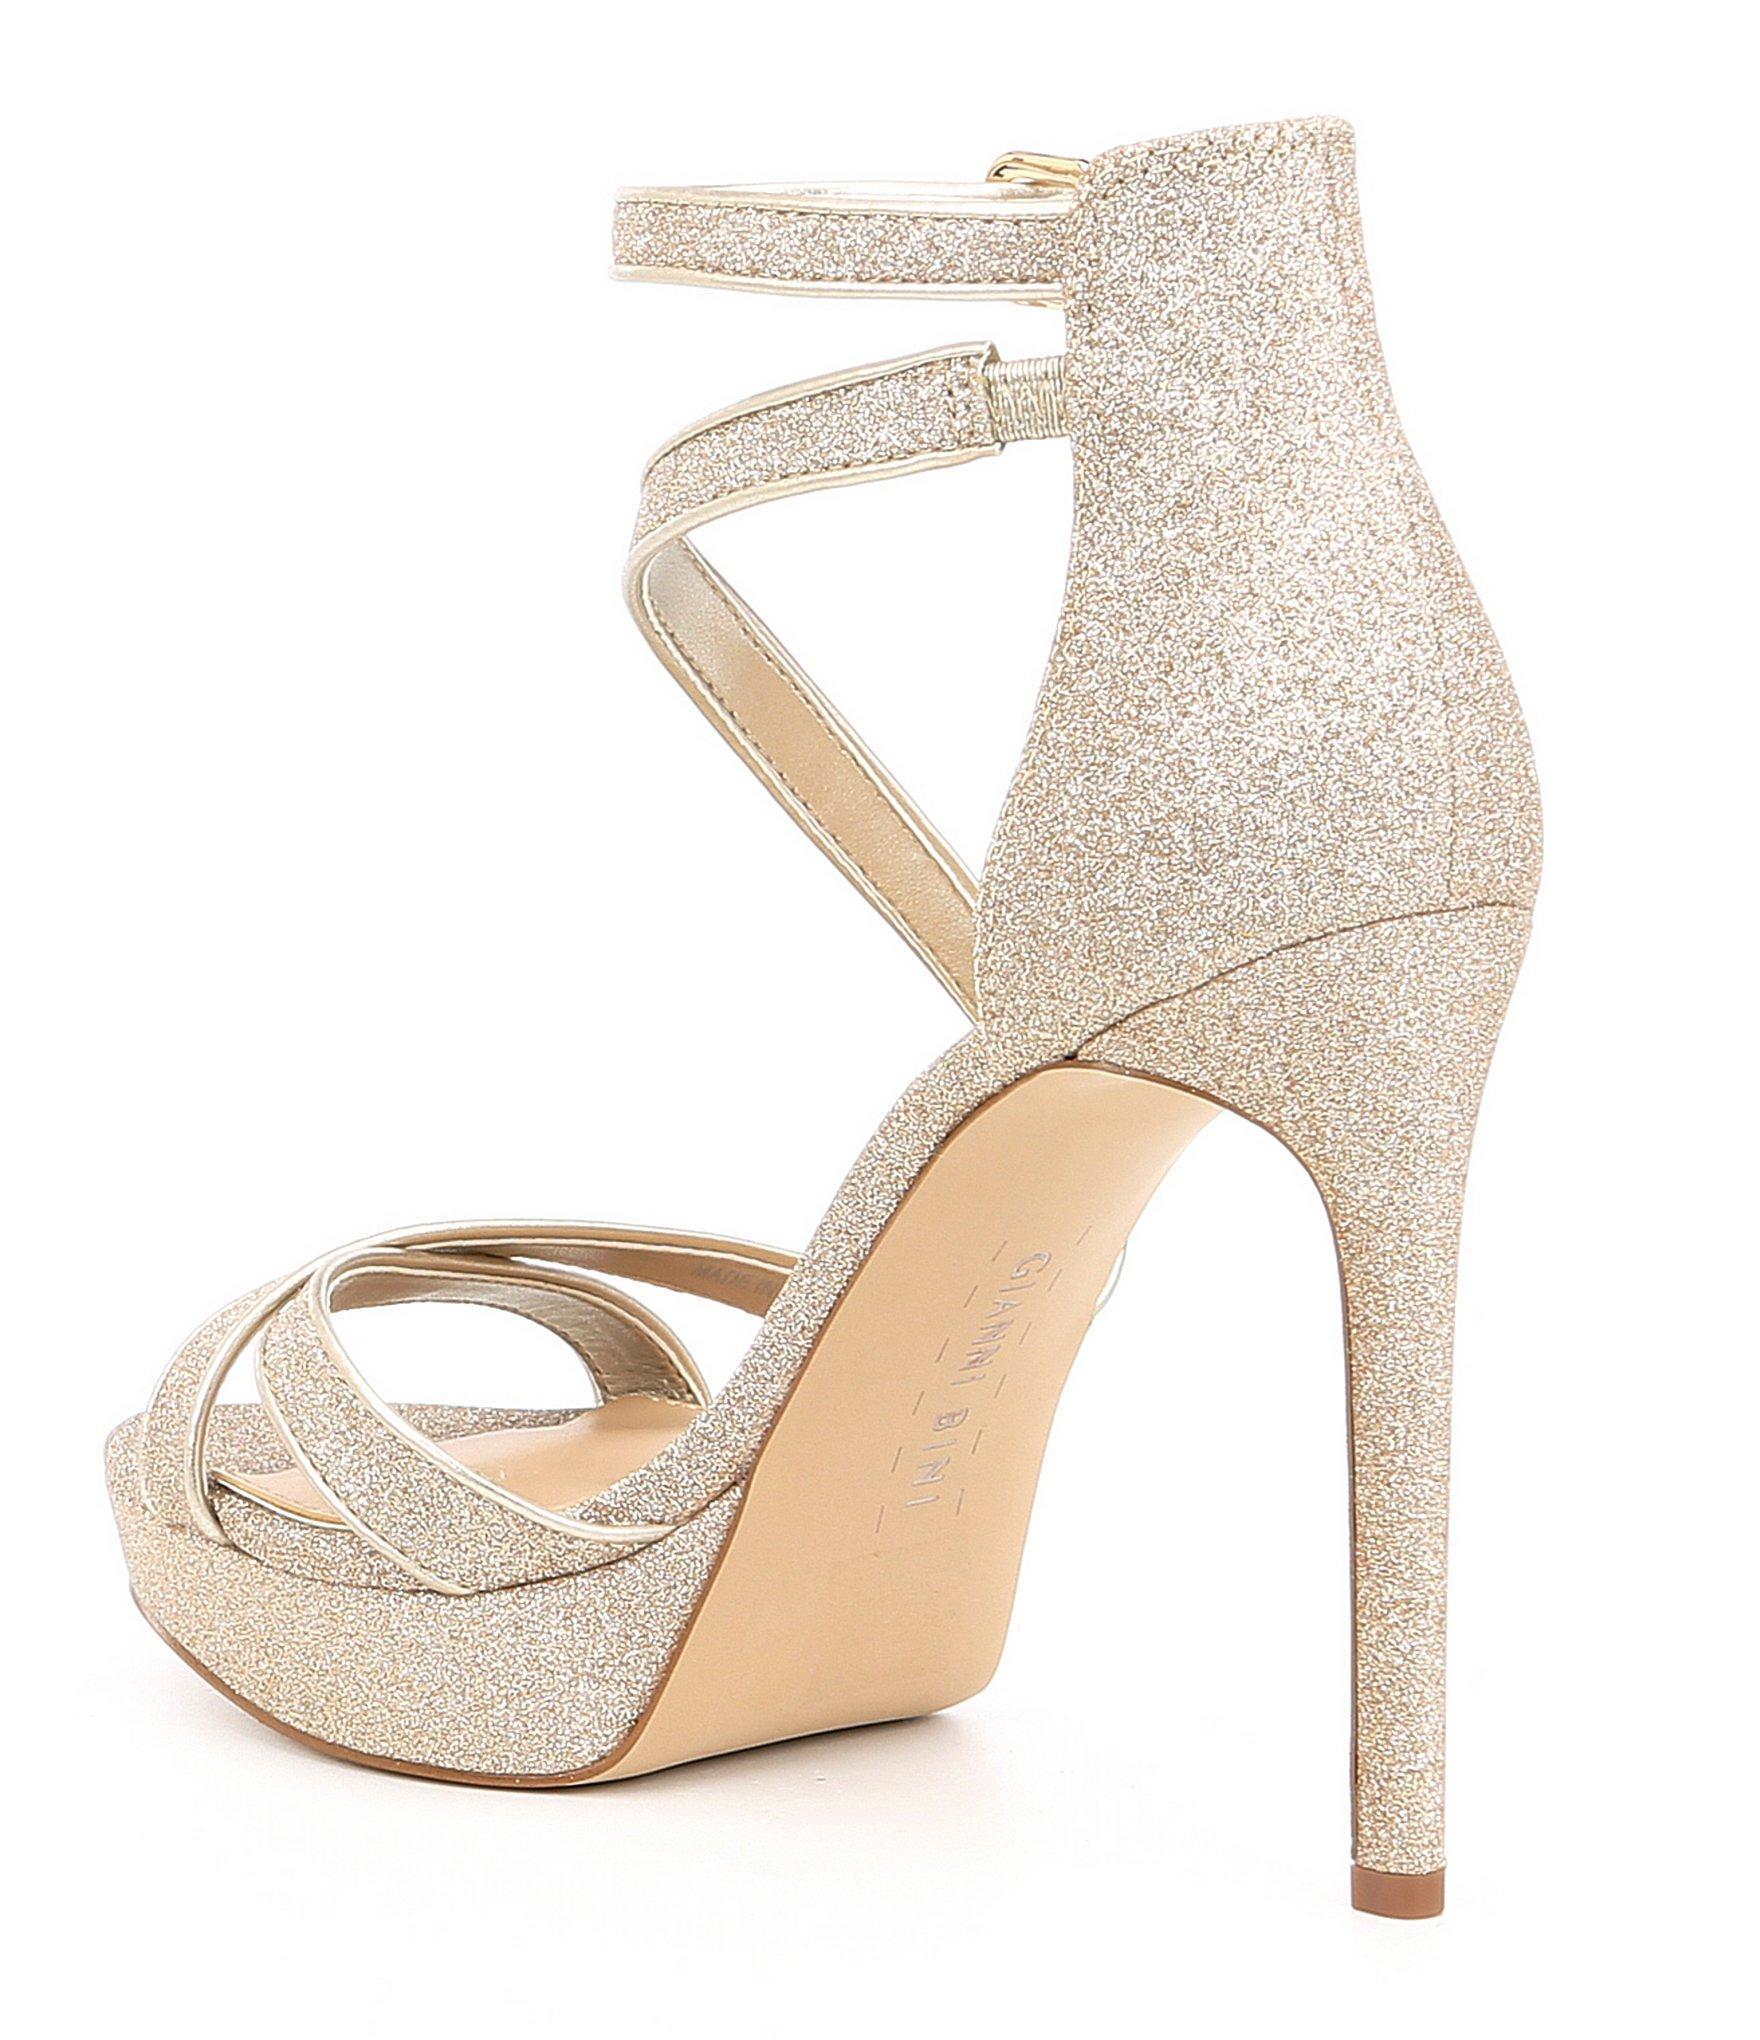 8c1c8c644e0 Gianni Bini - Metallic Corielle Glitter Strappy Platform Sandals - Lyst.  View fullscreen